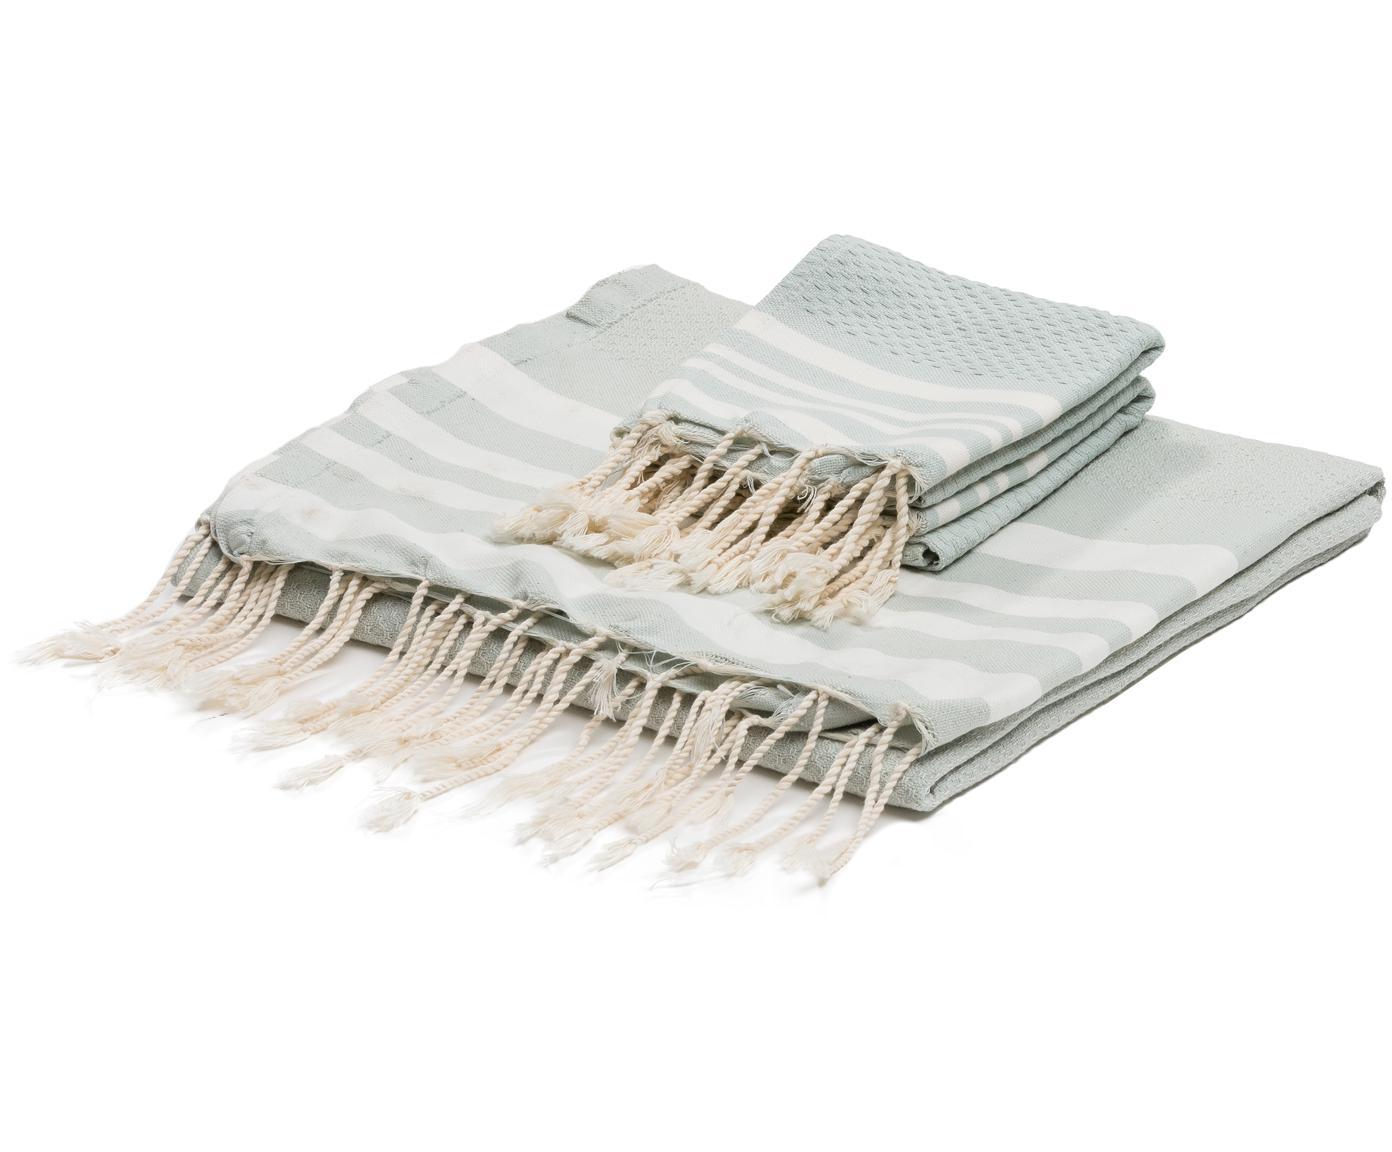 Leichtes Handtuch-Set Hamptons, 3-tlg., Mintgrün, Weiß, Sondergrößen